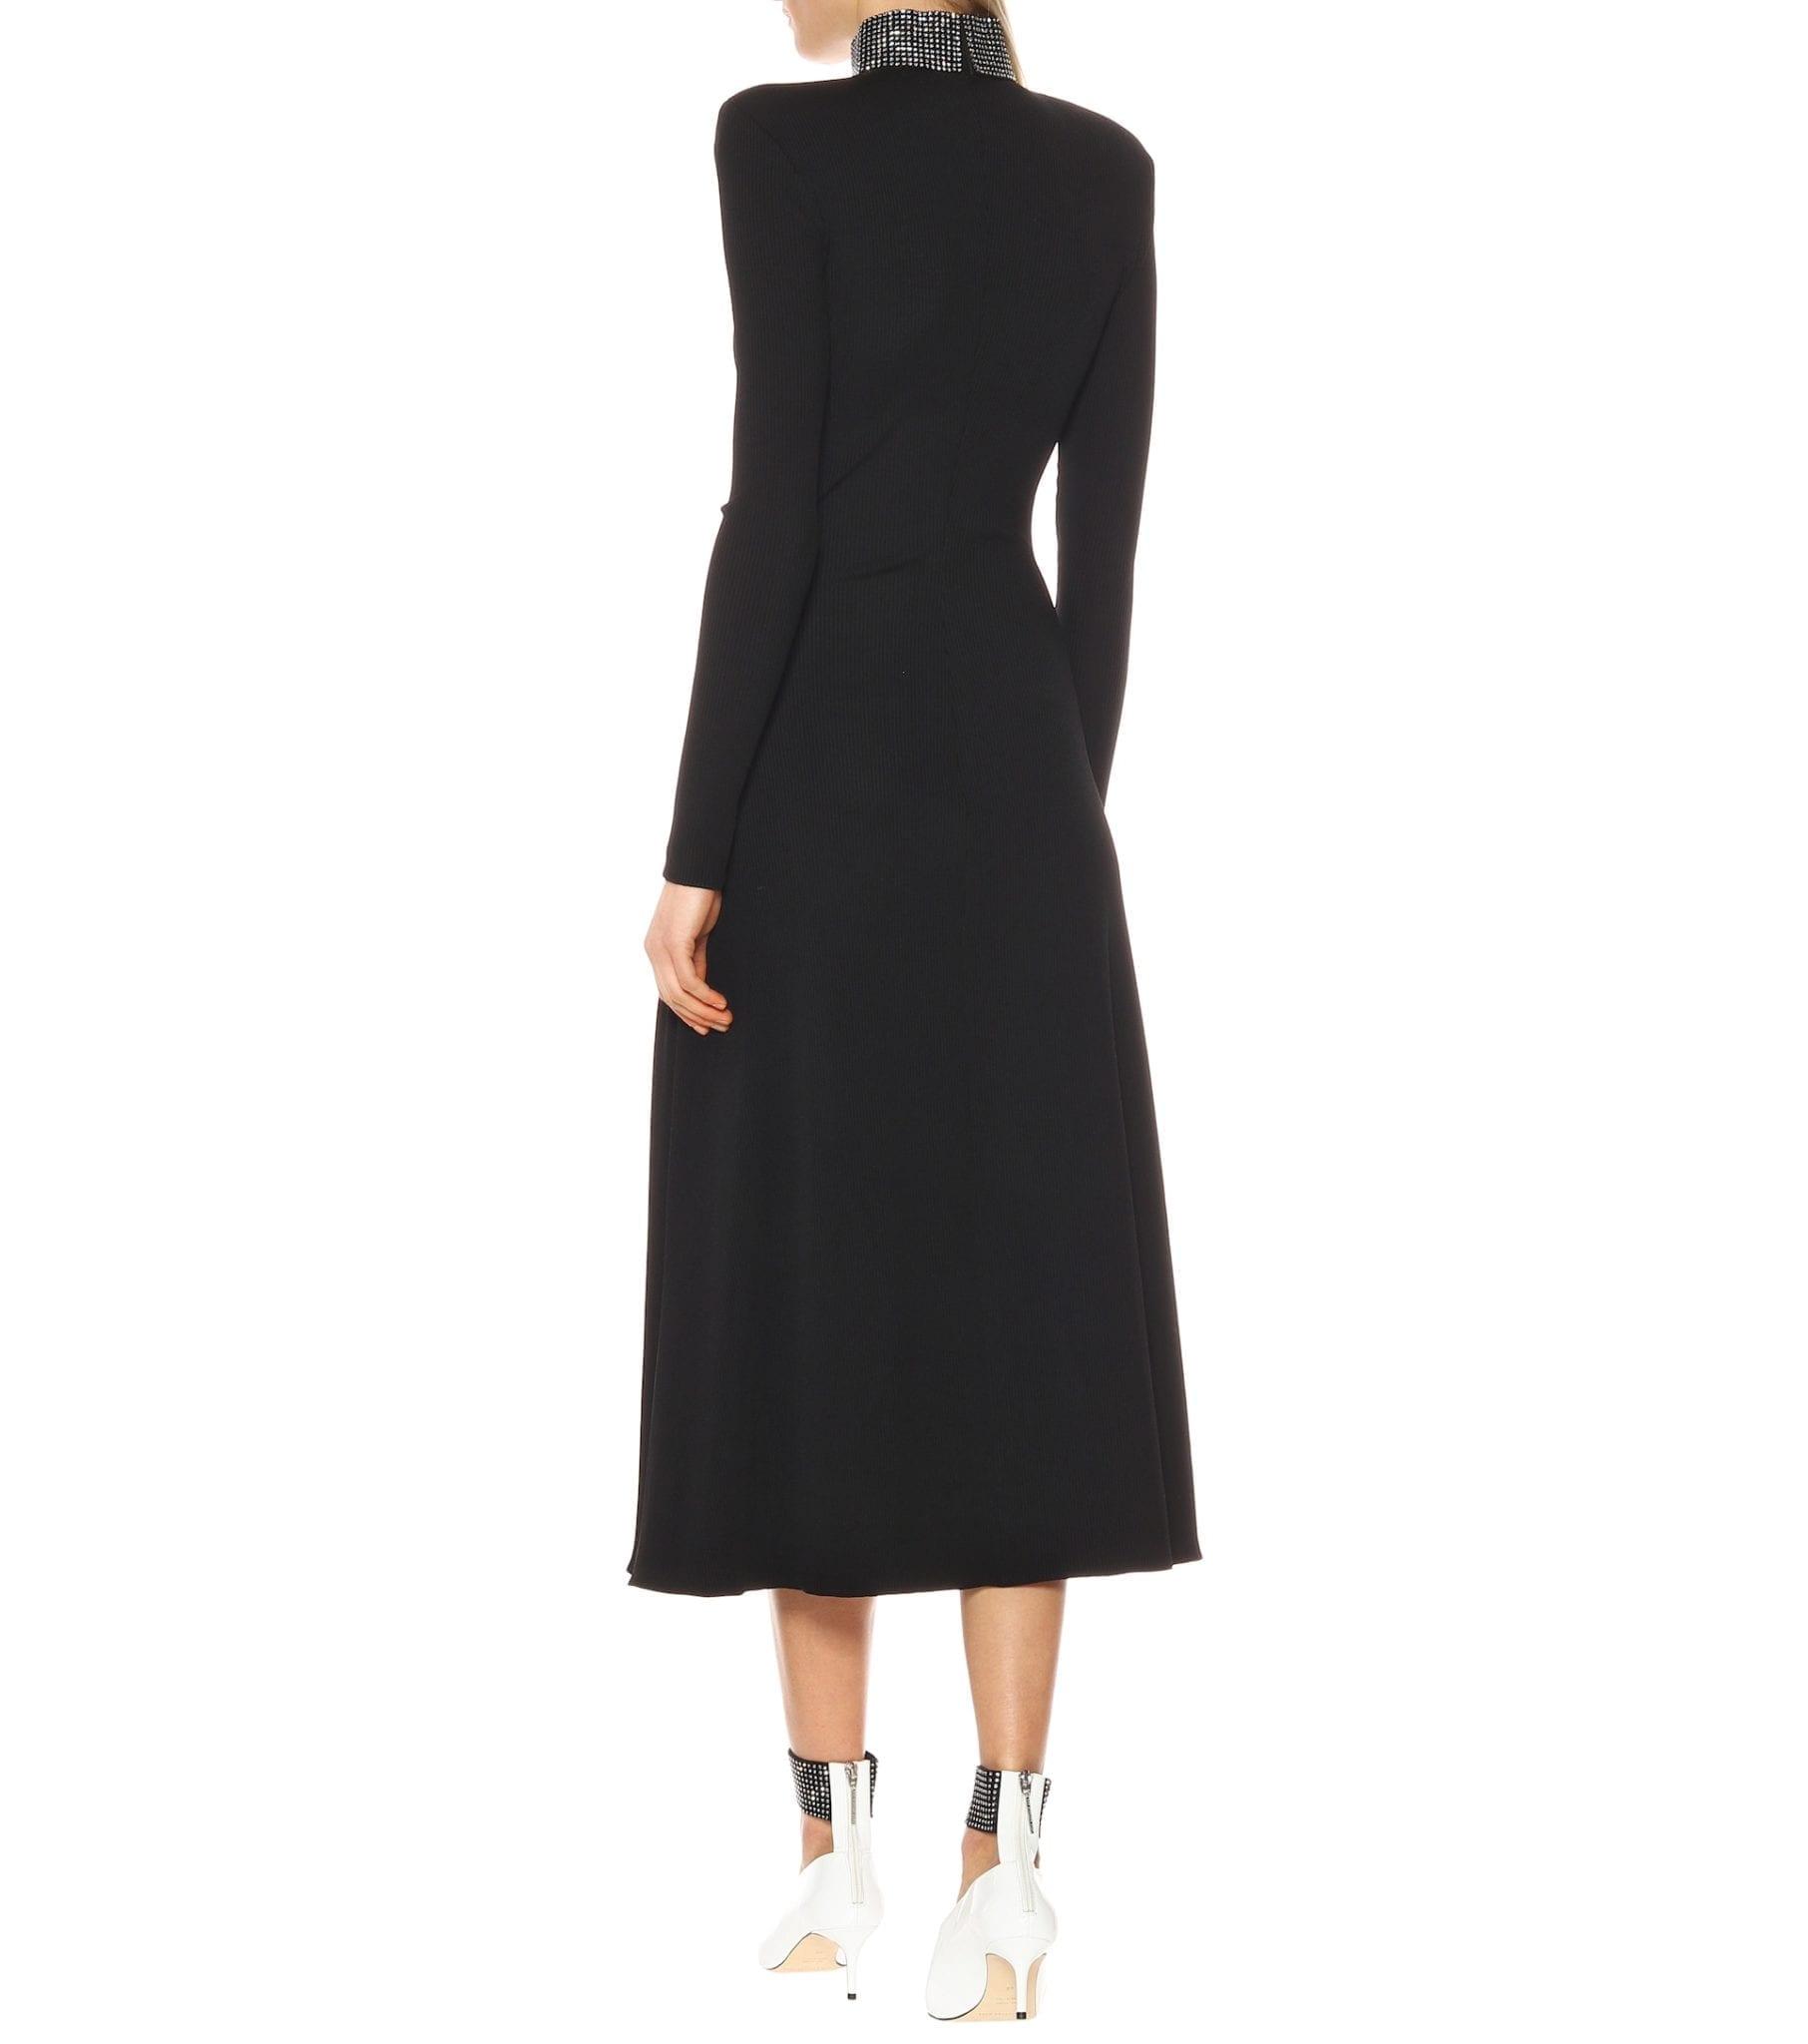 CHRISTOPHER KANE Embellished Stretch Knit Midi Black Dress